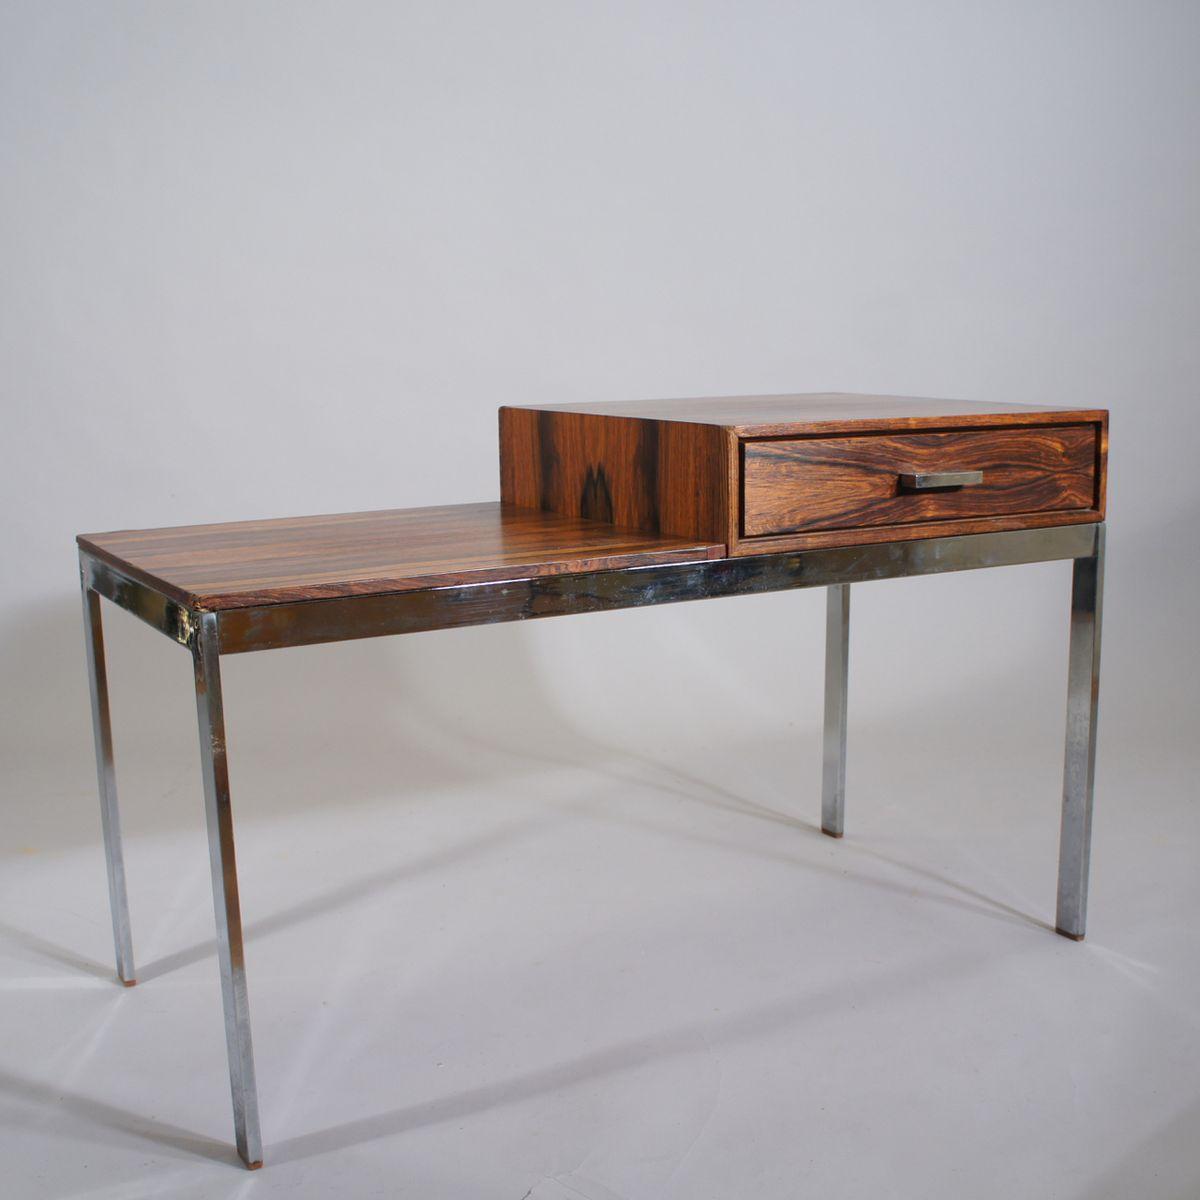 Panca mid century in metallo e legno con cassetto di - Panca giardino ikea ...